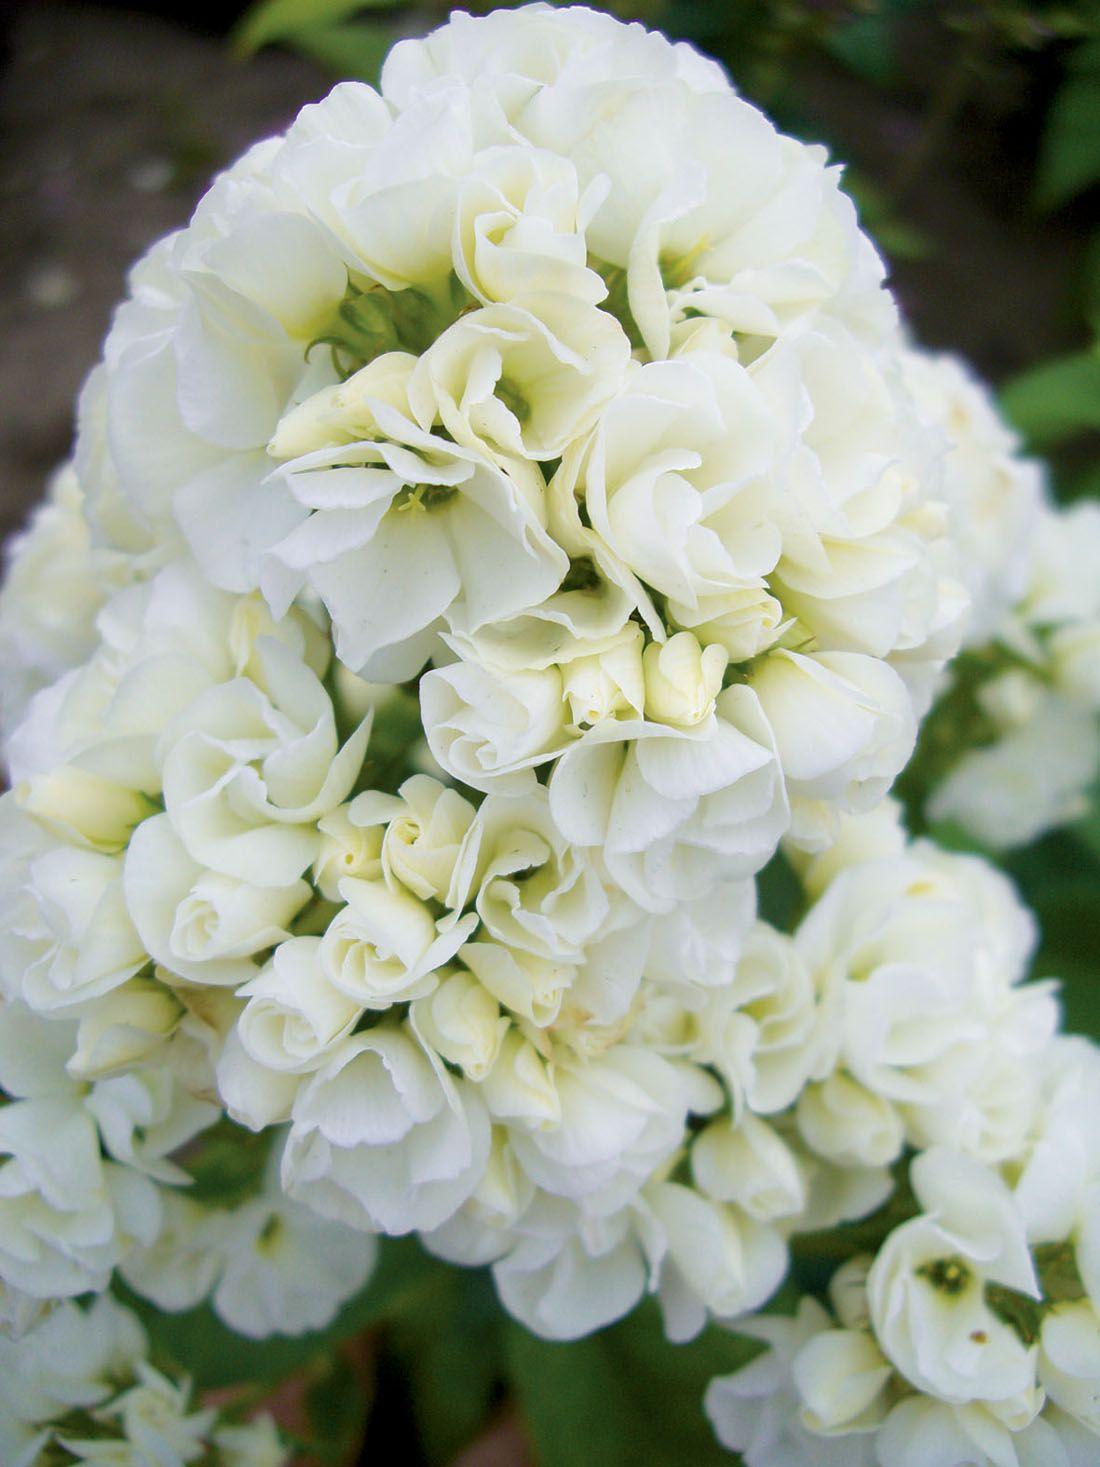 Ganz und zu Extrem Phlox paniculata 'Tiara'   Flowers - Buds, Blossoms & More &YD_32